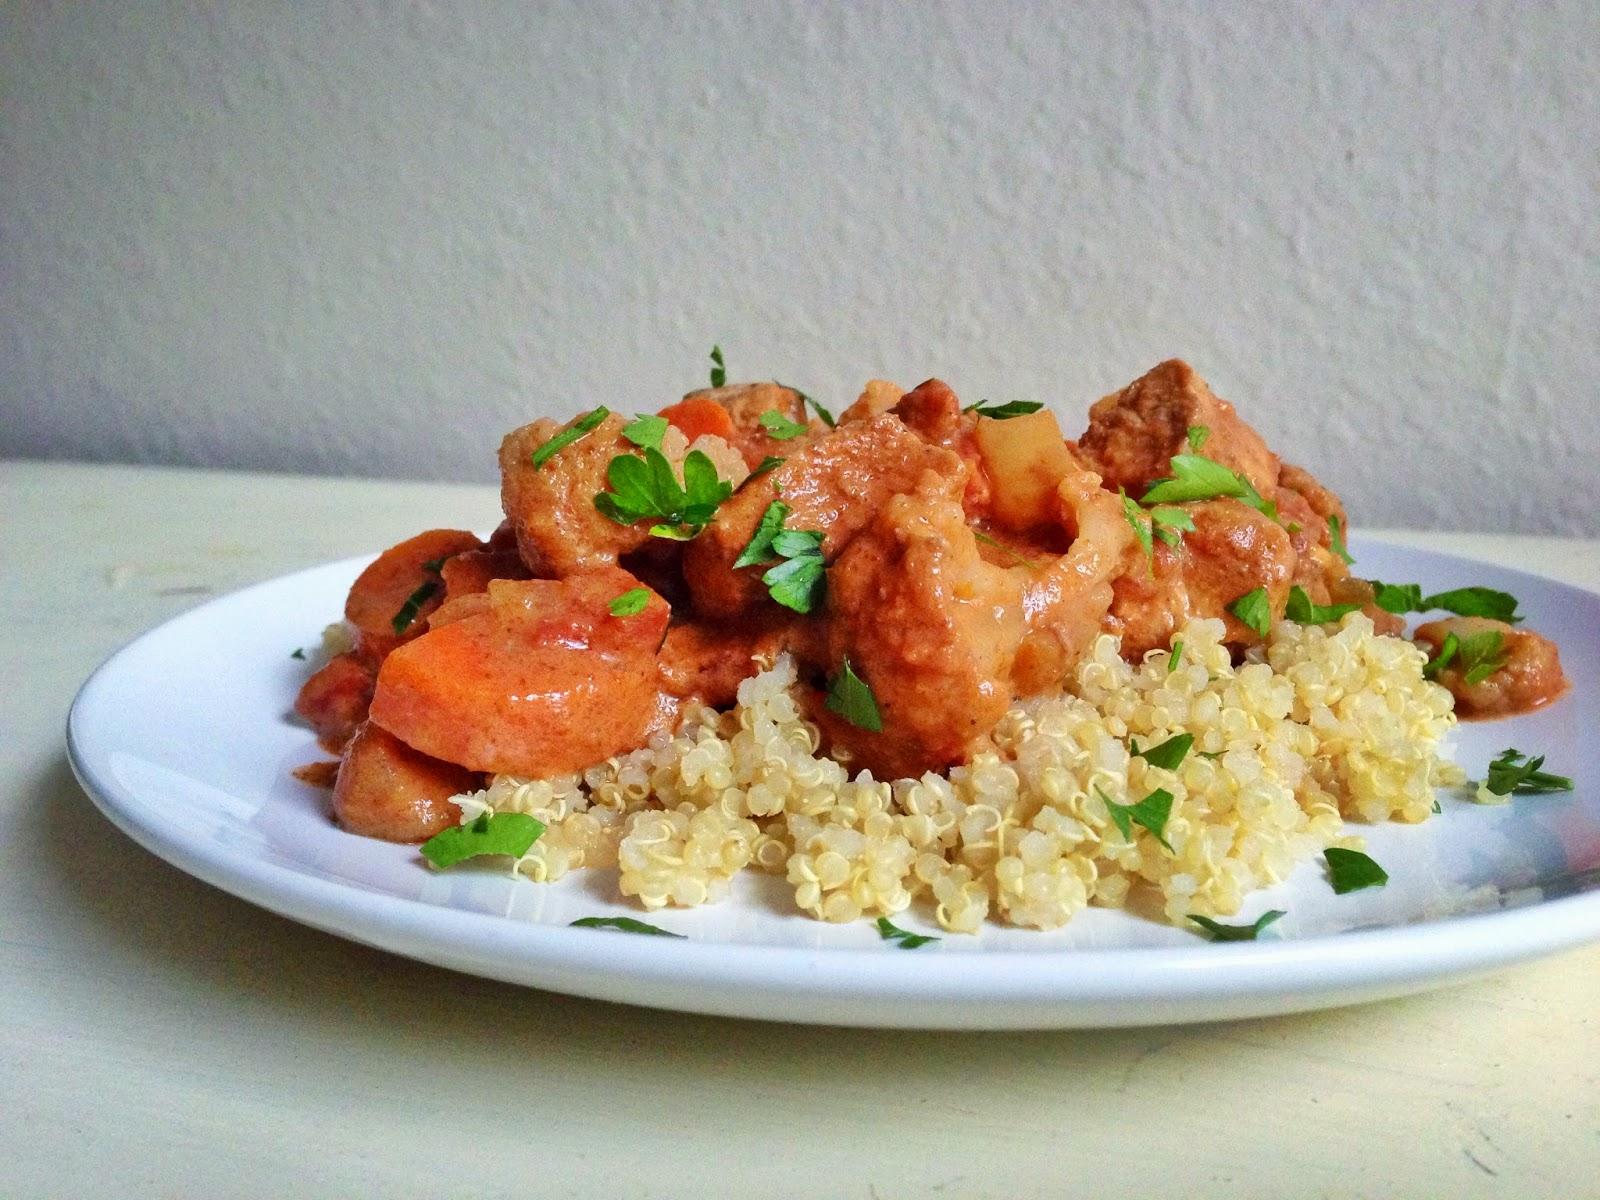 living beautifully...on a budget: Skinny Chicken Tikka Masala